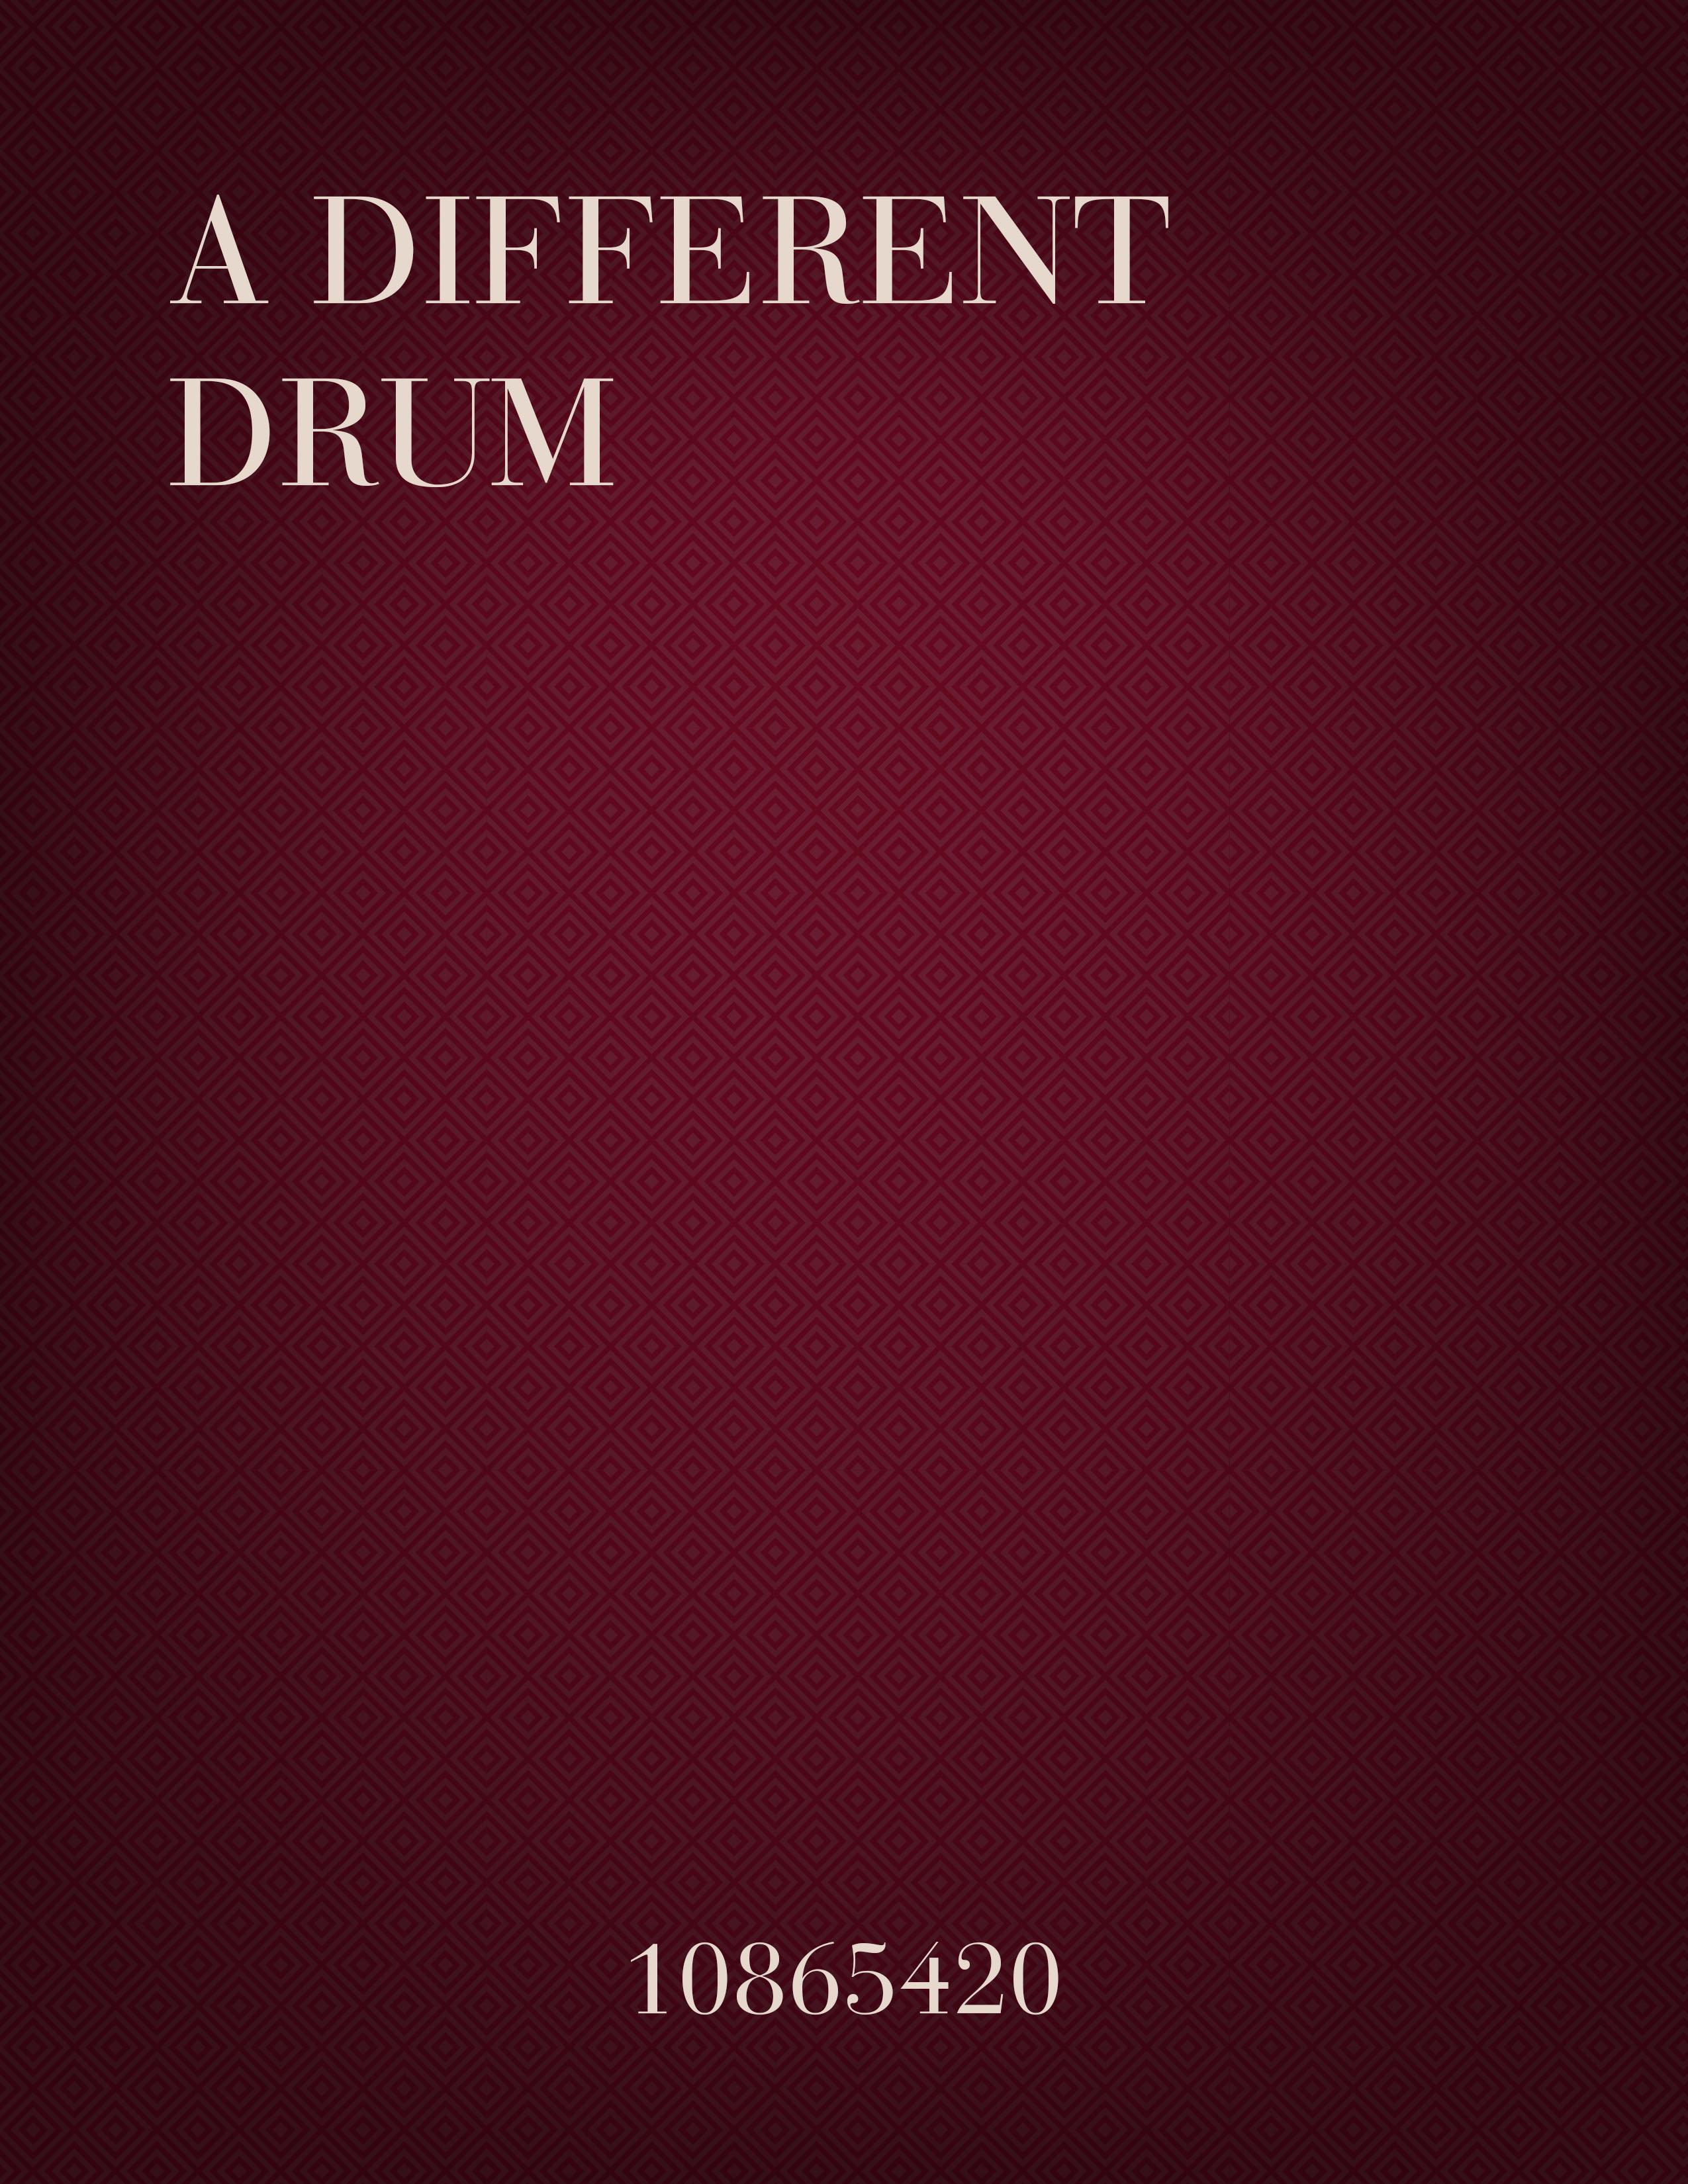 A Different Drum (3-part)